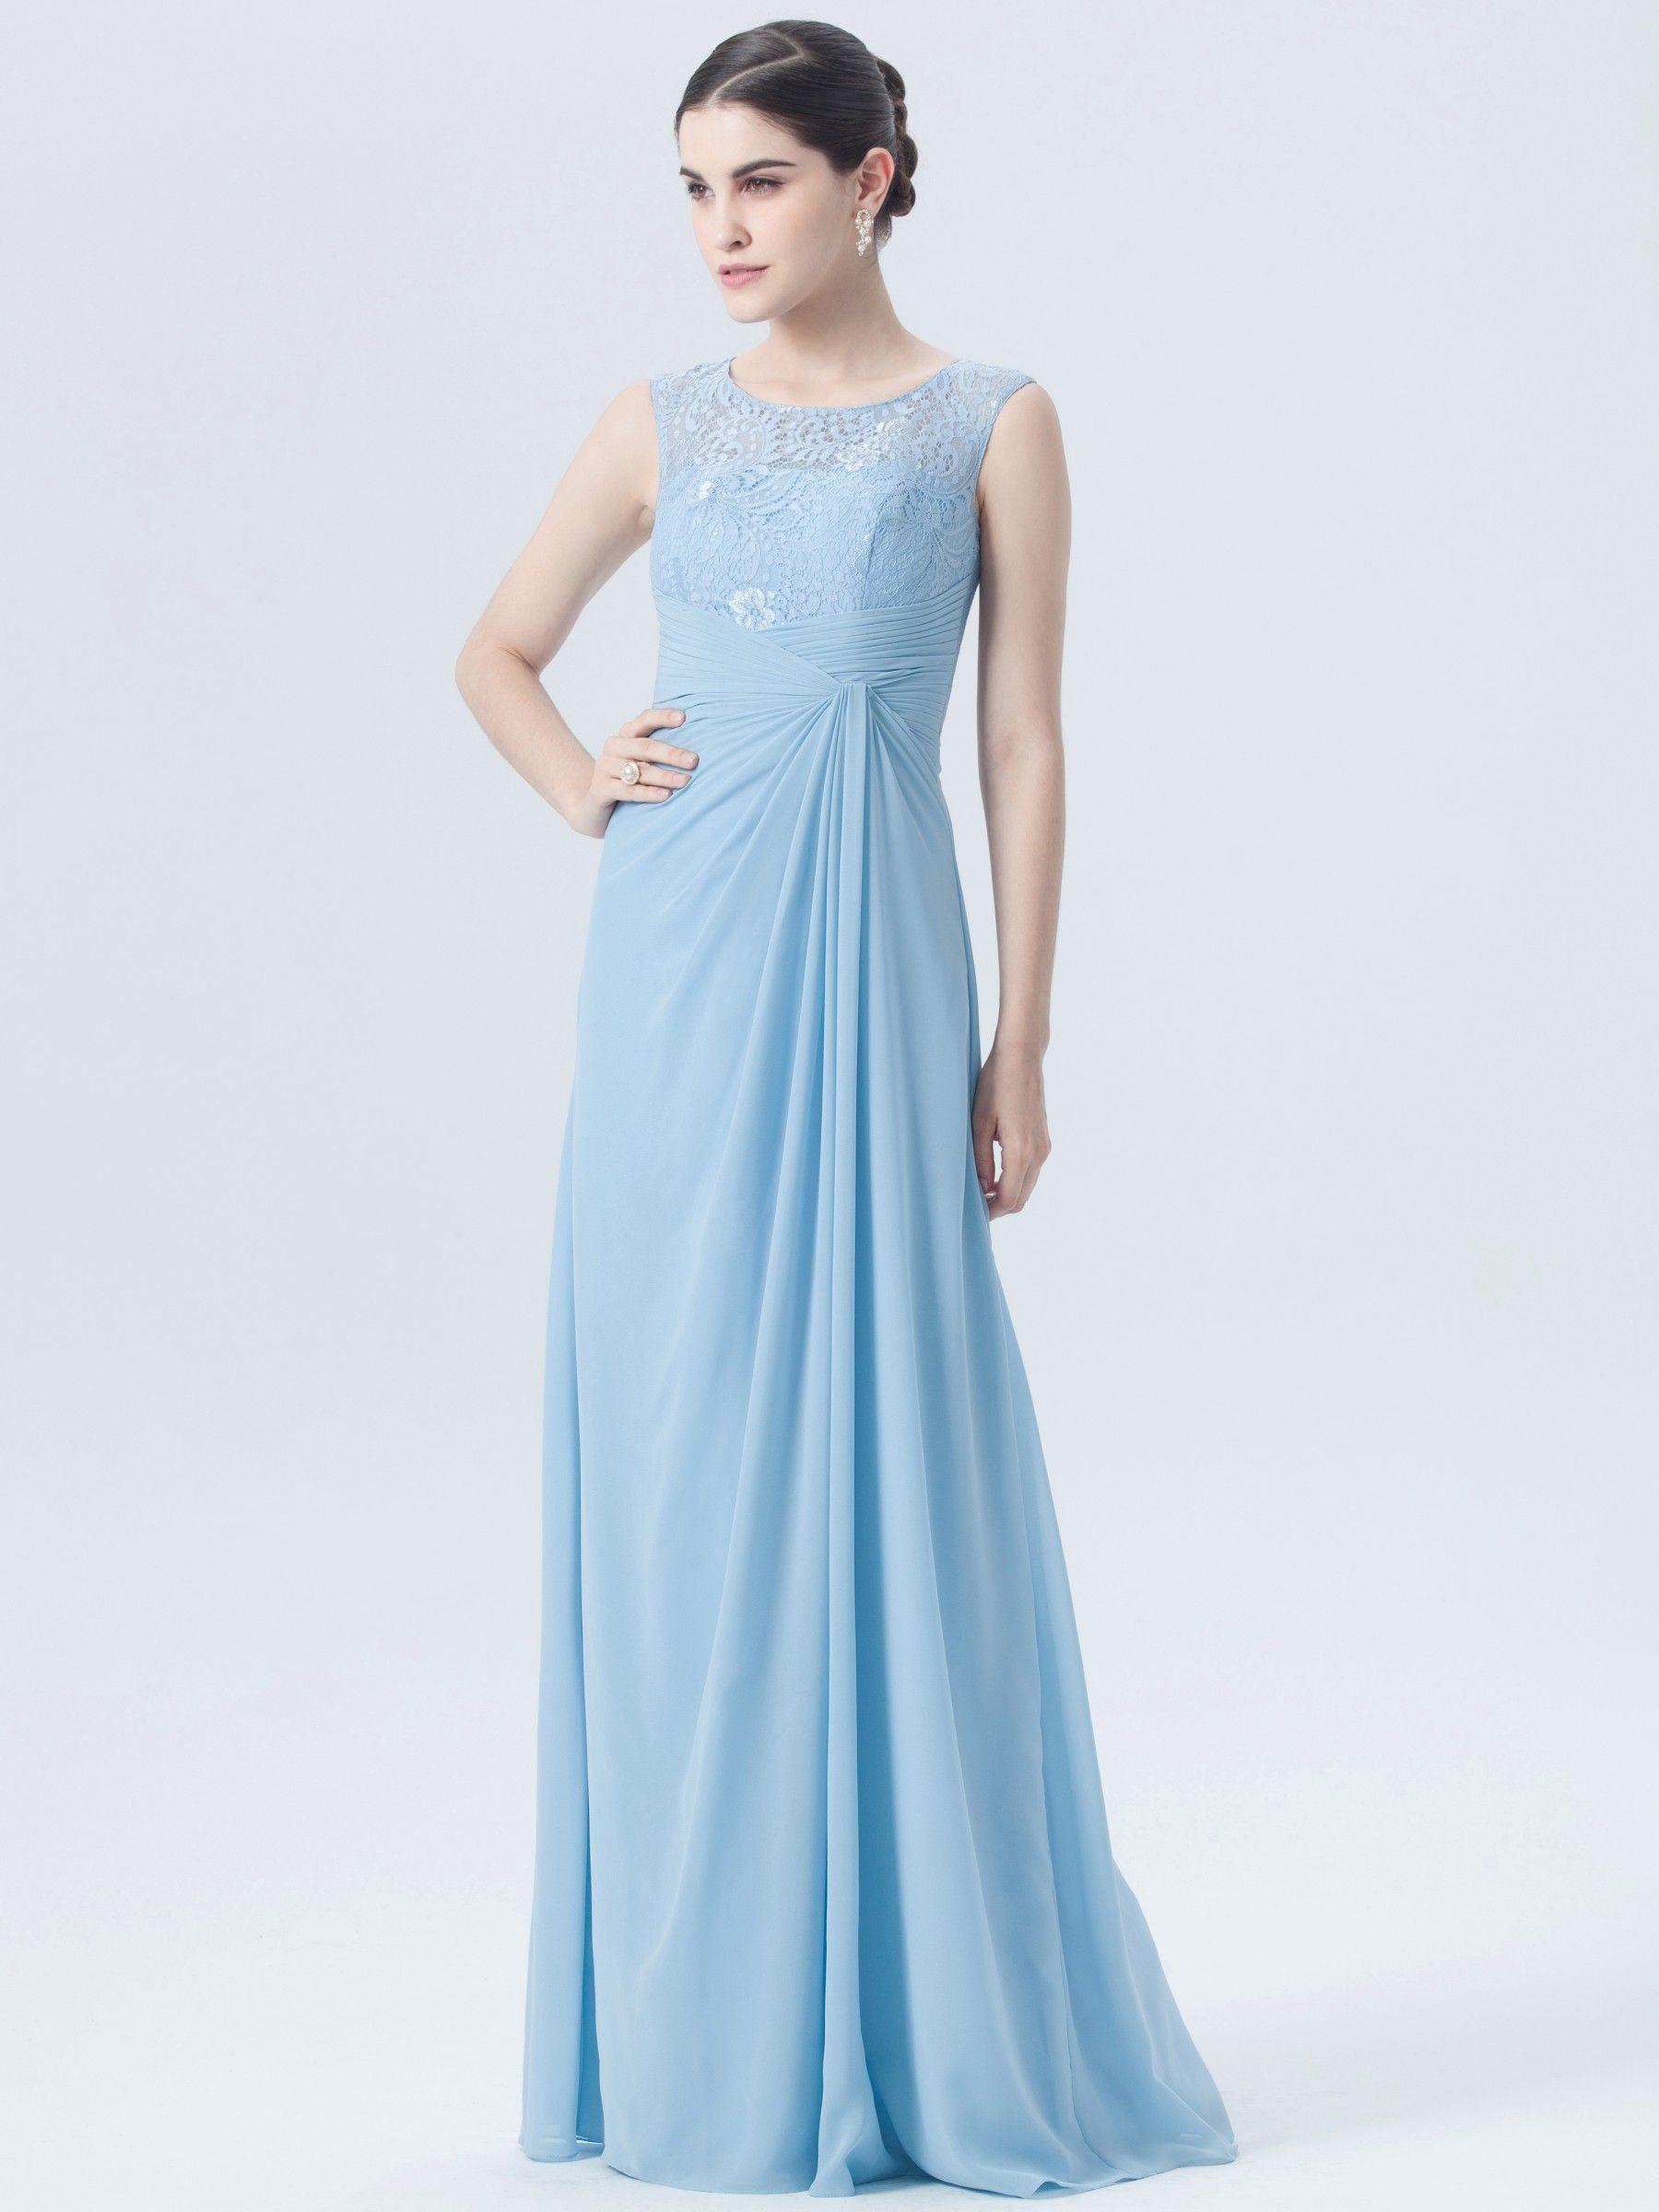 Illusion Neckline Lace Chiffon Dress | Plus and Petite sizes ...